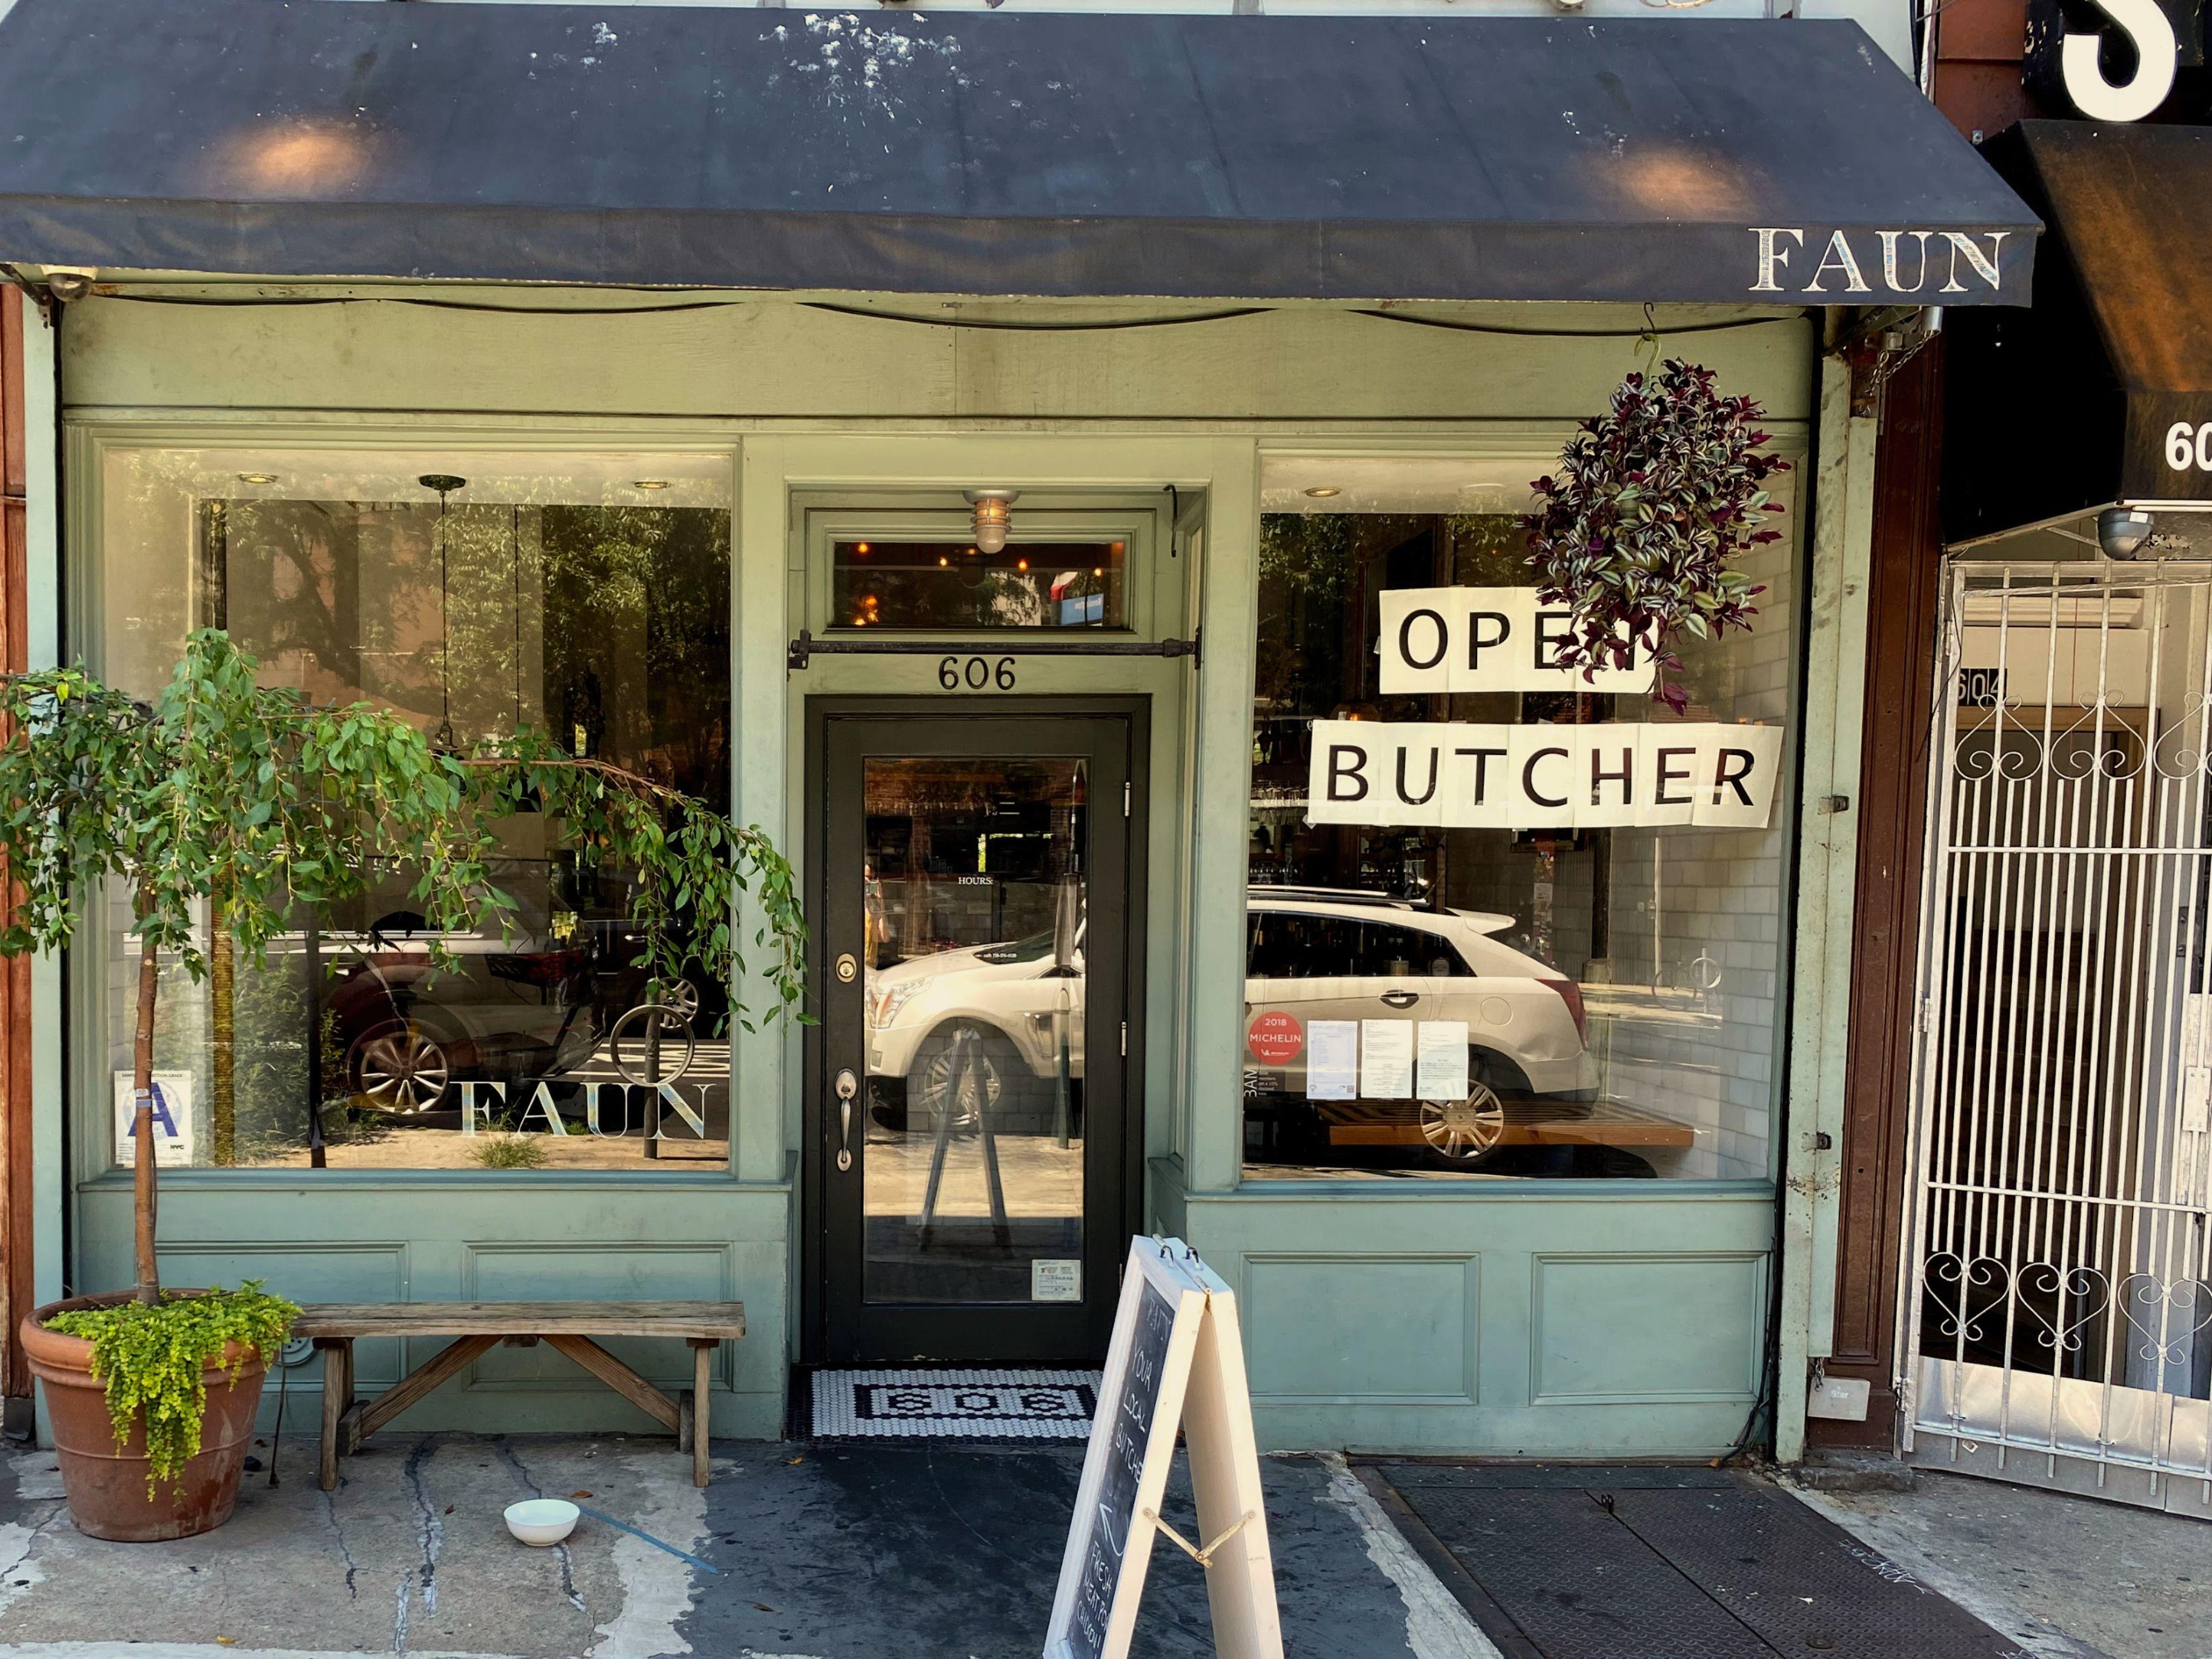 Greg & Corey's Pop Up Butcher Shop inside fo Faun